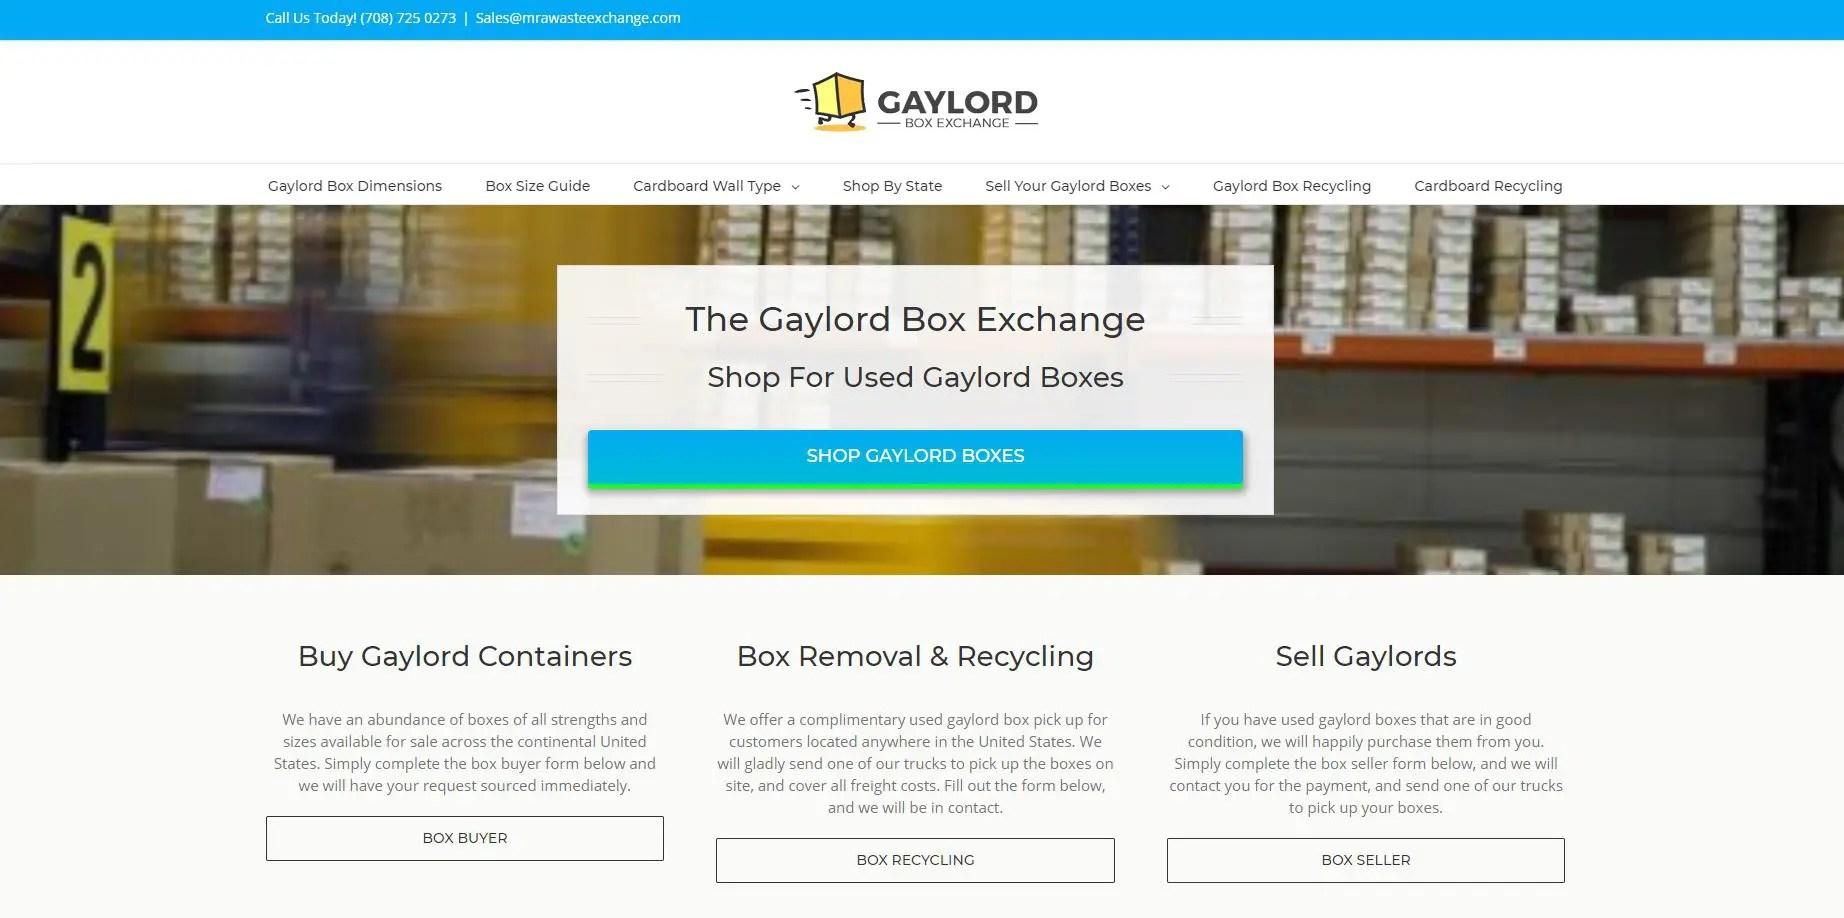 Gaylord box exchange website